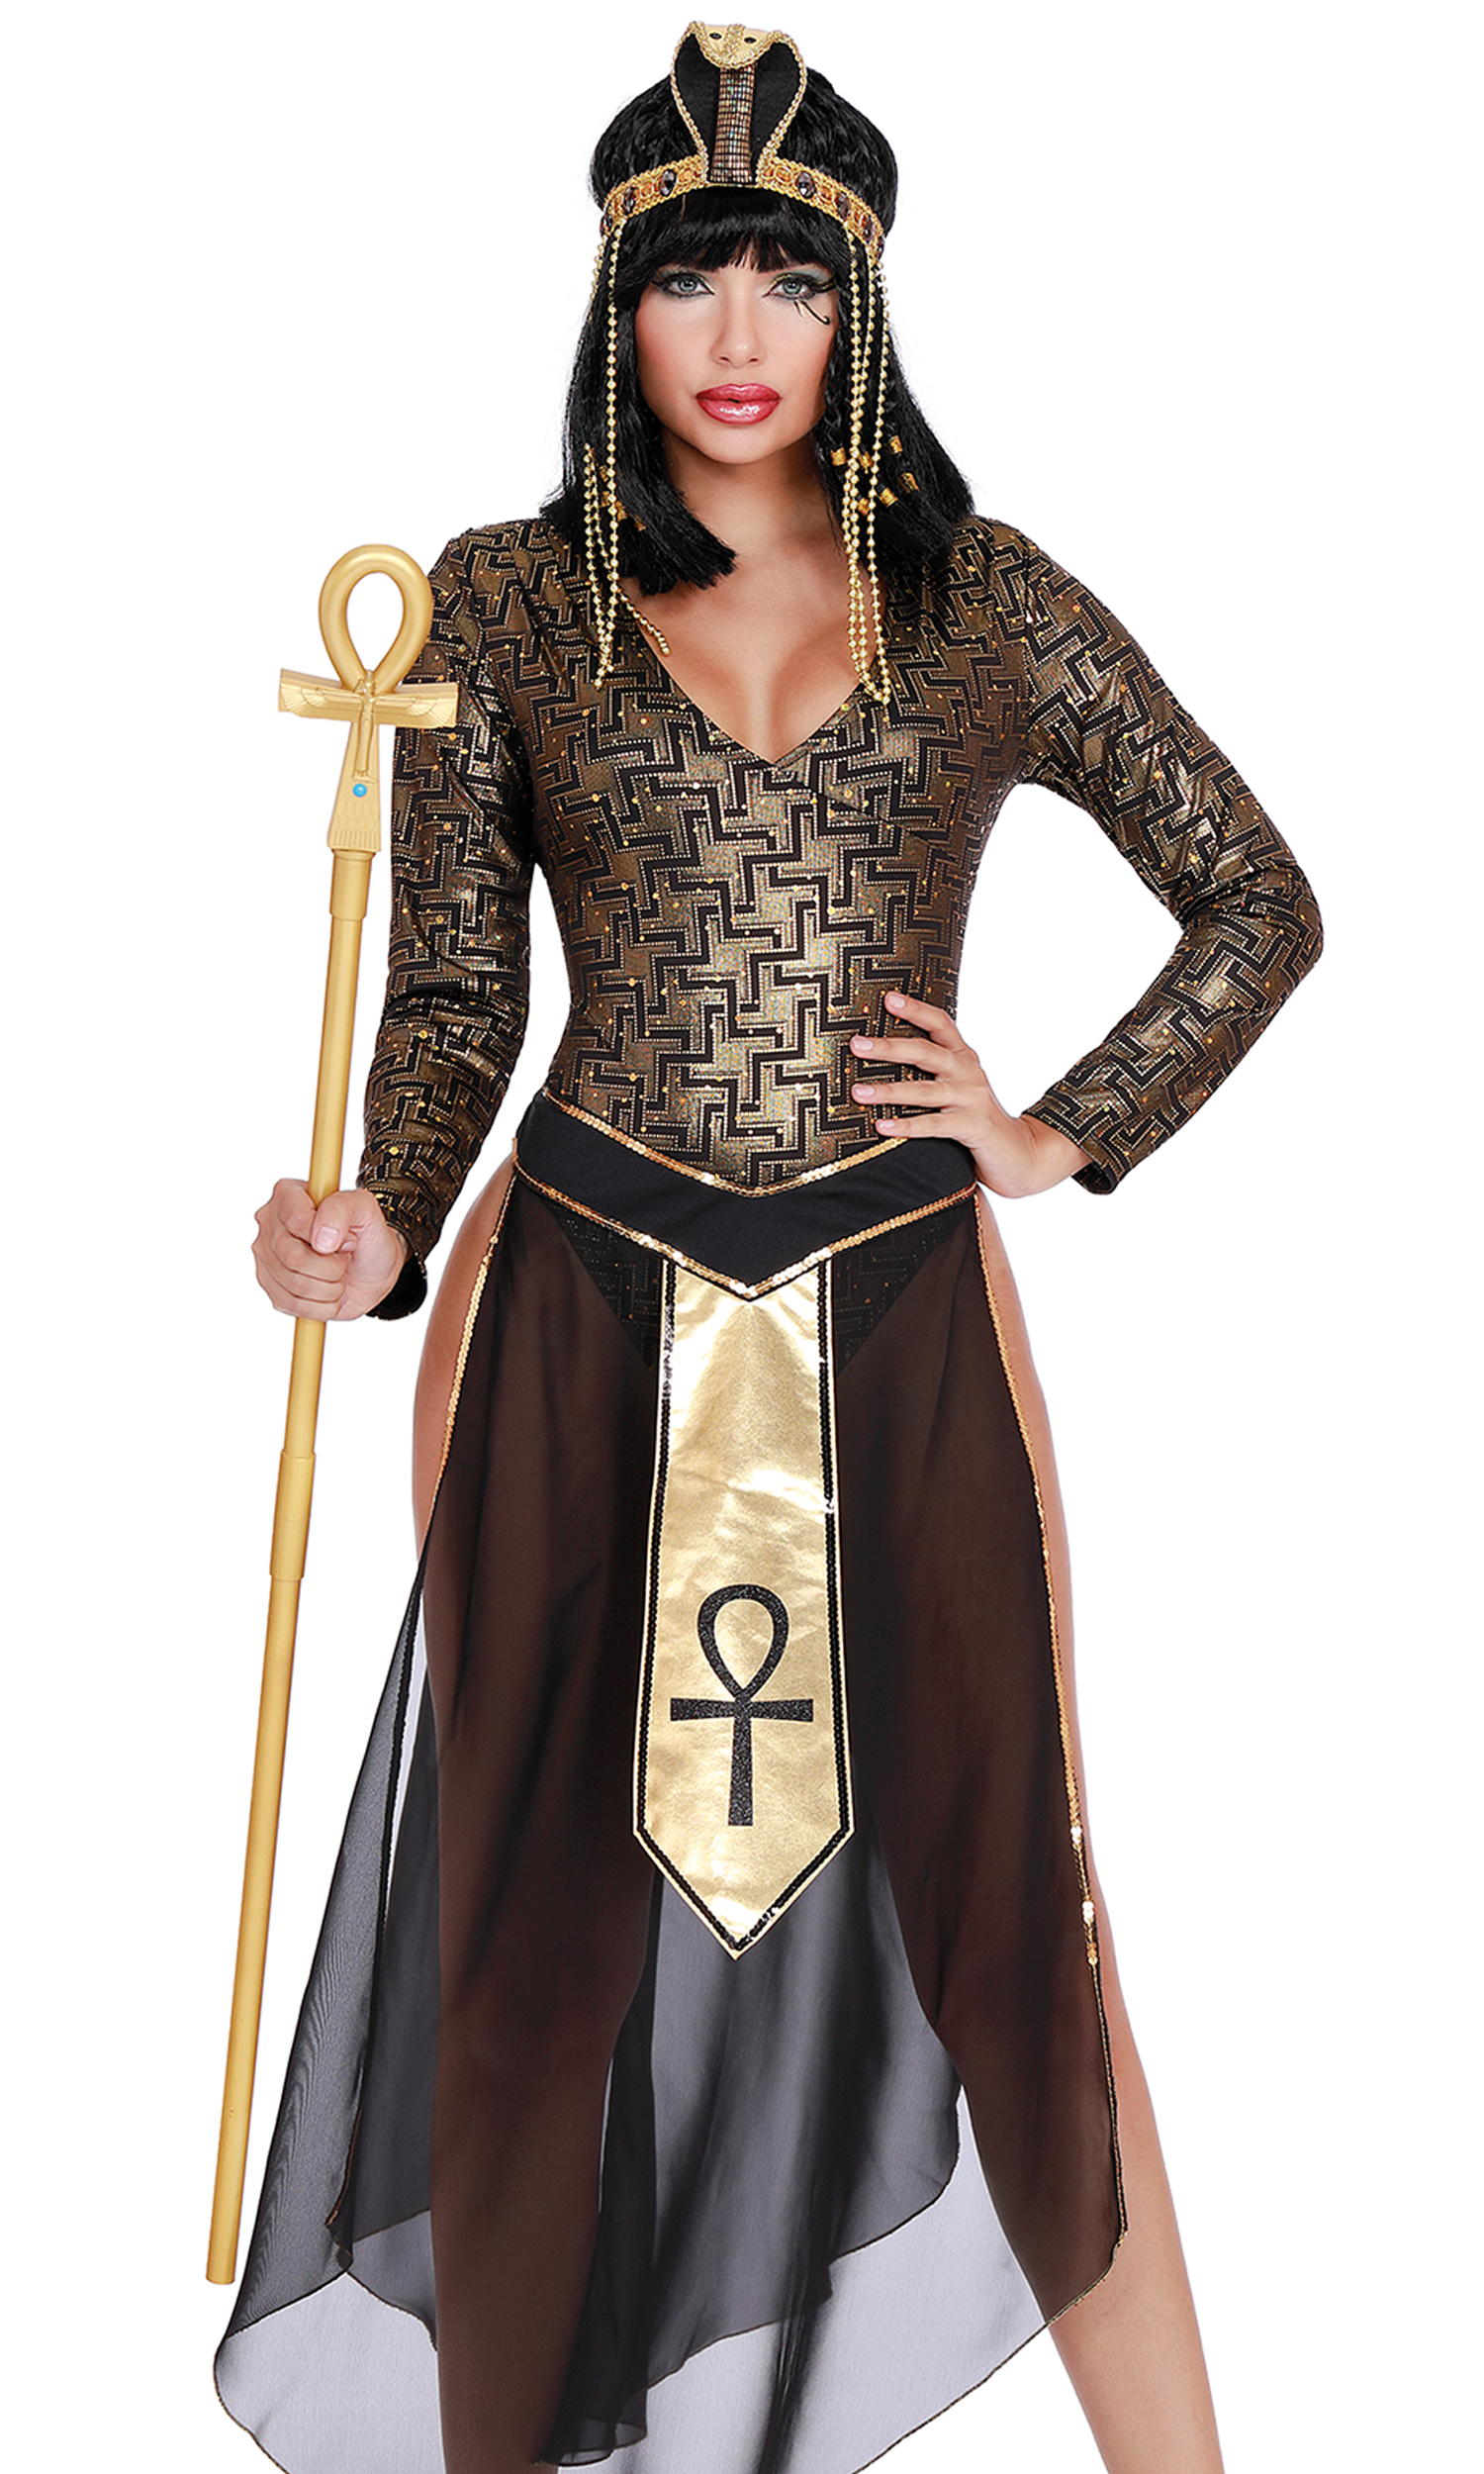 e29c0d46173 Queen Cleo Cleopatra Costume